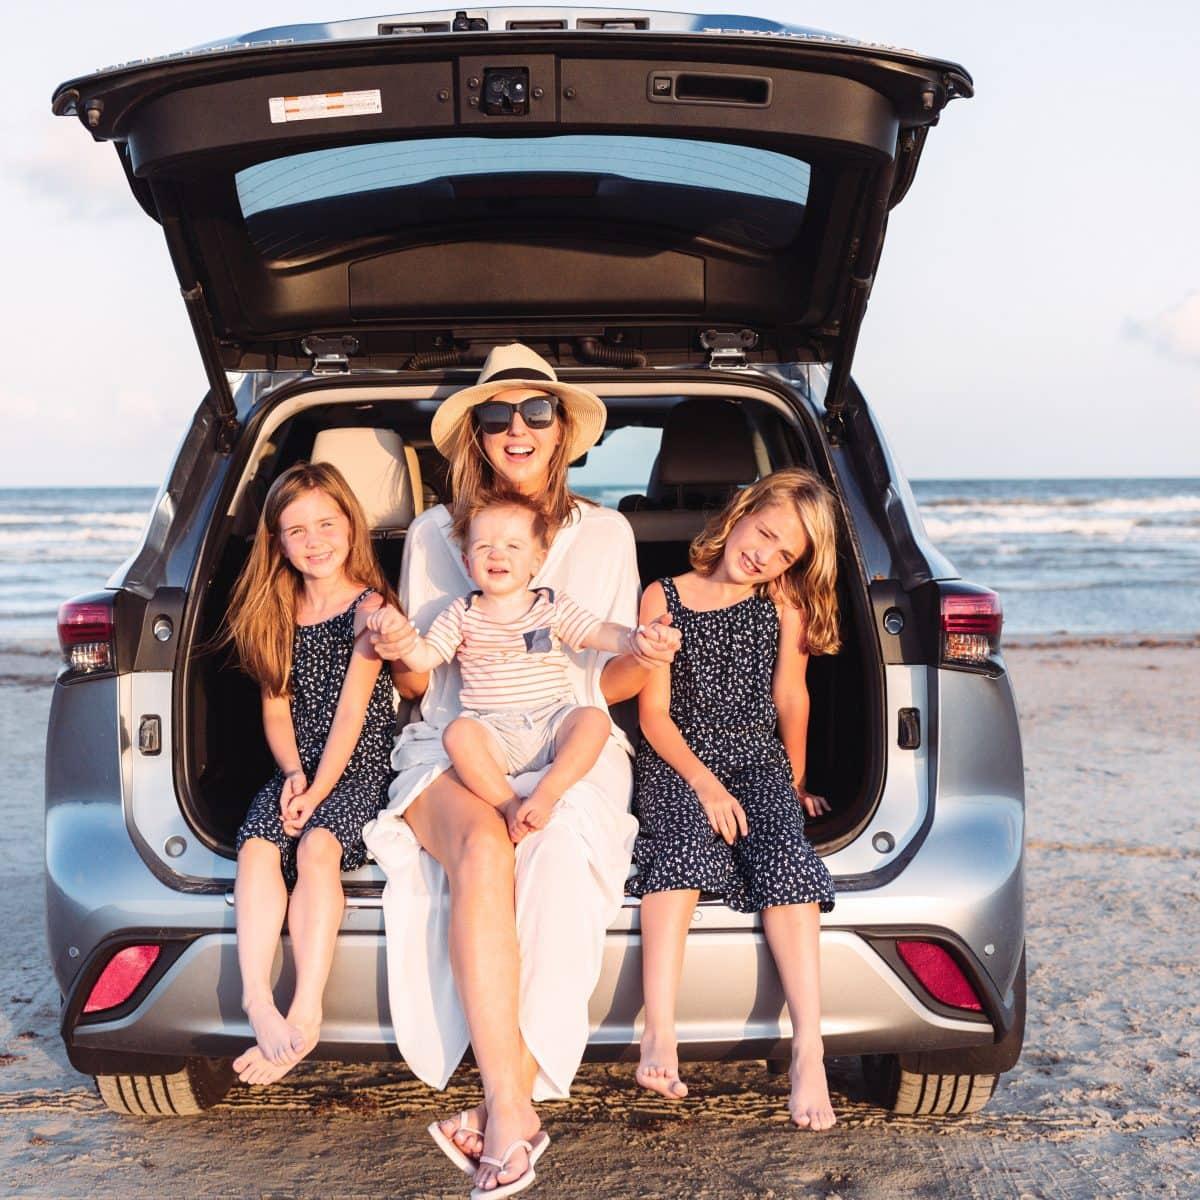 Traveling safely to Port Aransas Texas 2020